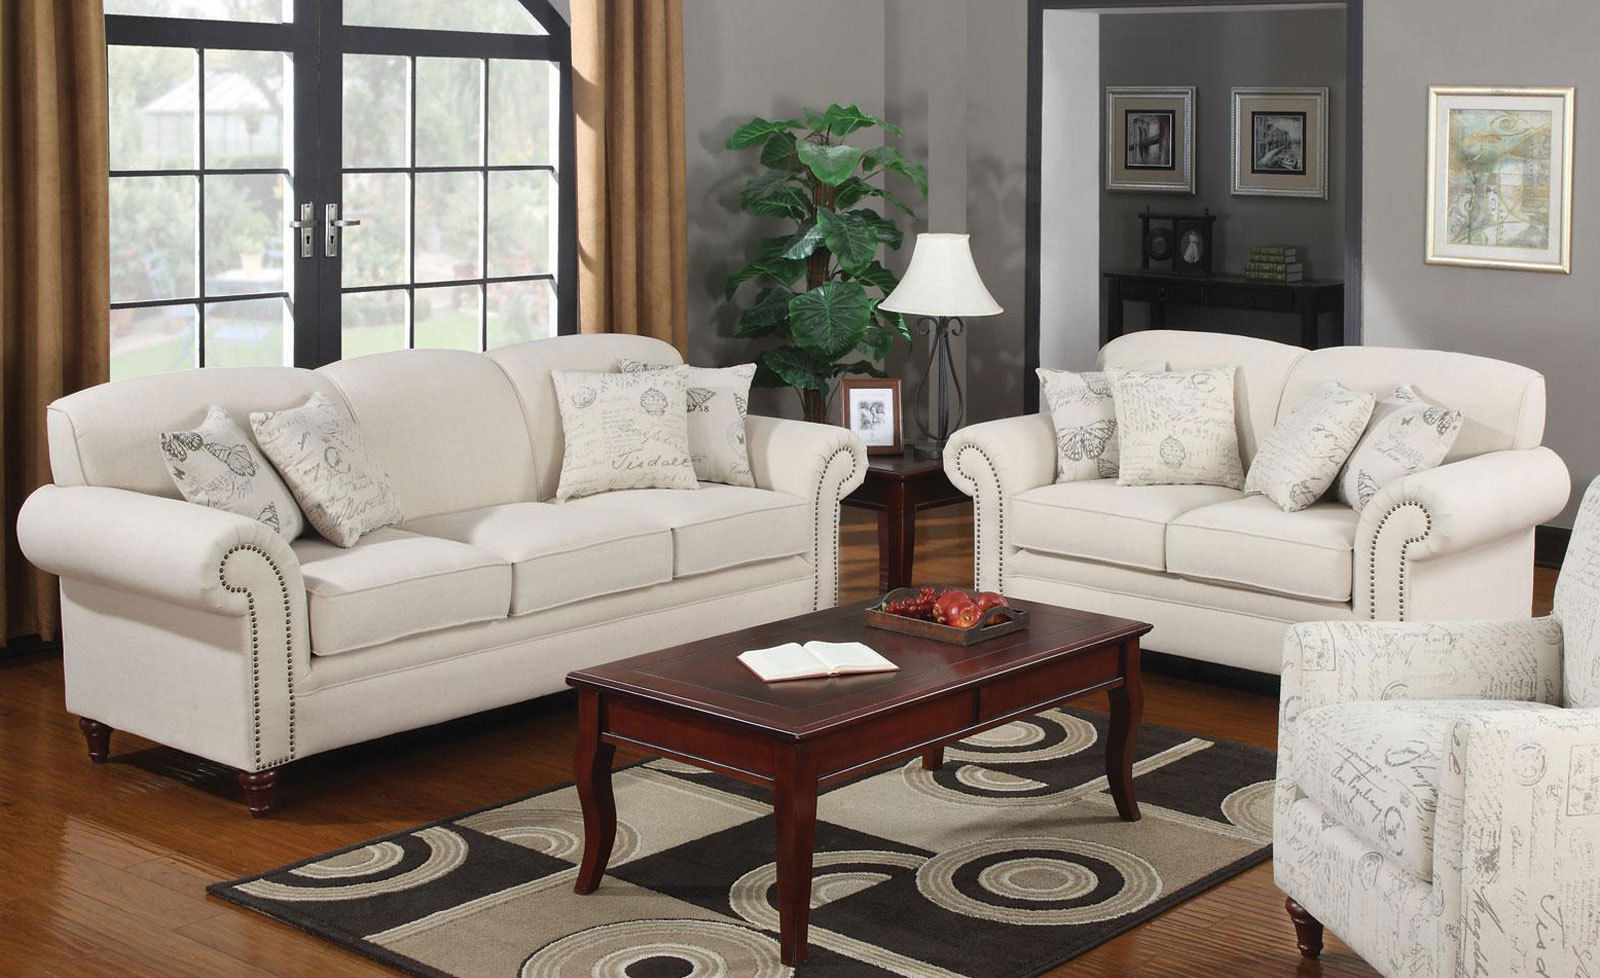 traditional design living room couch set beige fabric. Black Bedroom Furniture Sets. Home Design Ideas